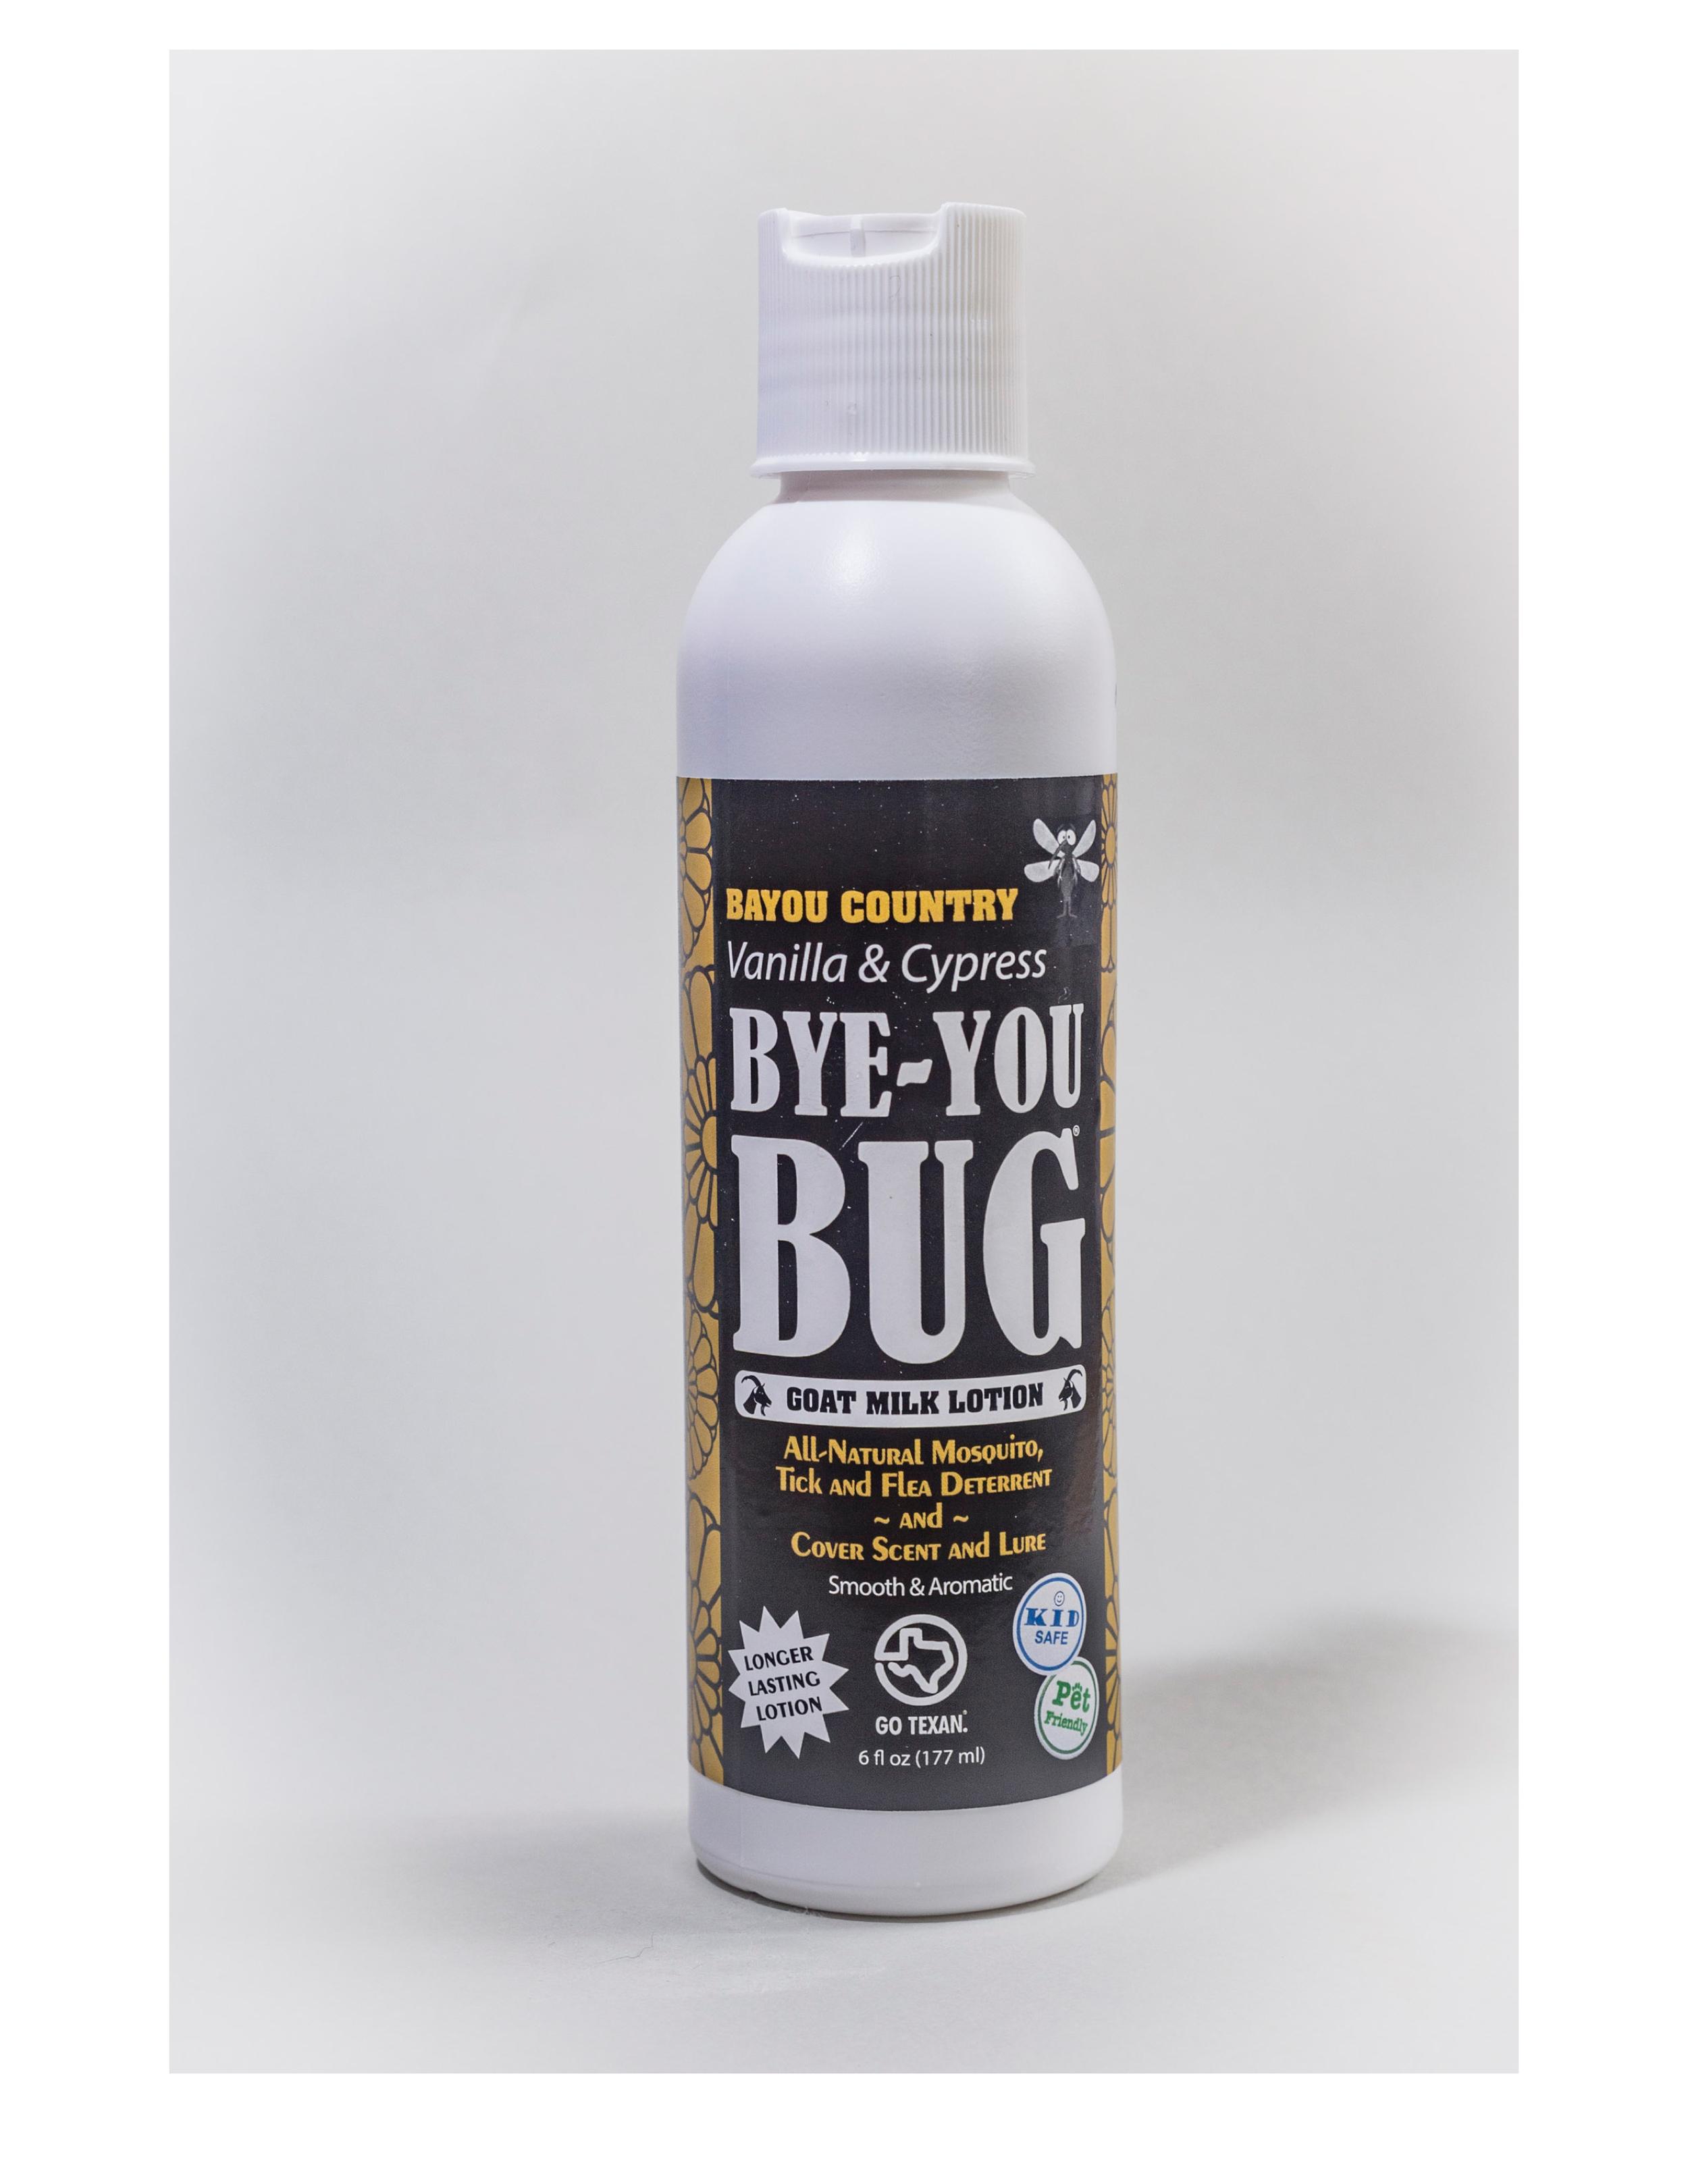 mcdonner bye you Bug final for print-3.jpg